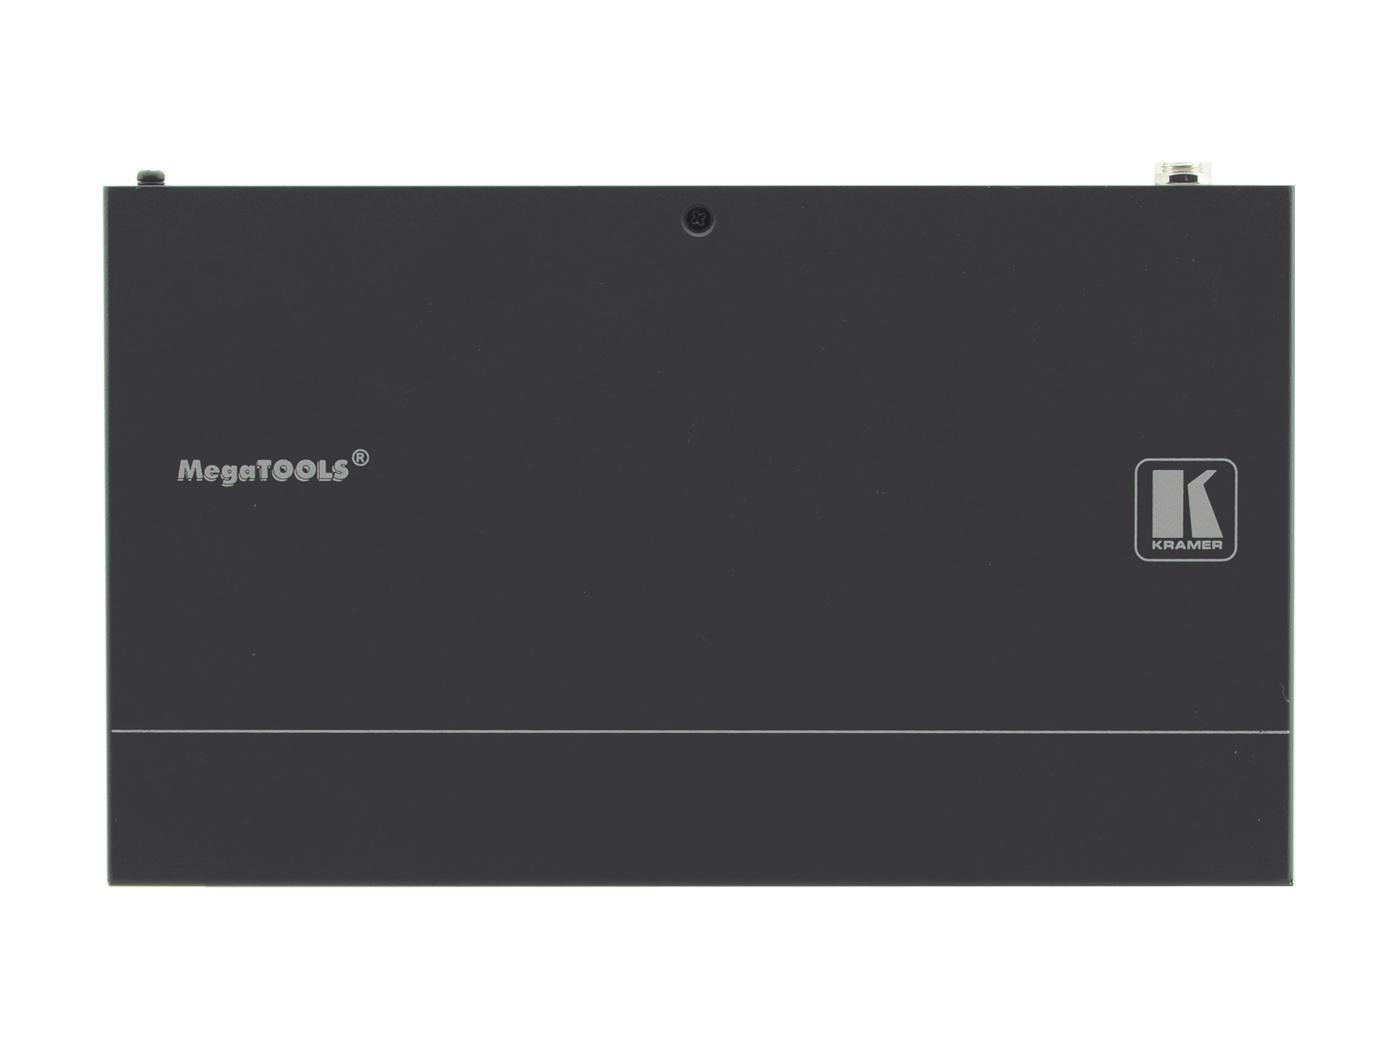 Kramer KDS-EN5 4K60 HDMI H.264 Video Encoder supporting PoE and Video Wall